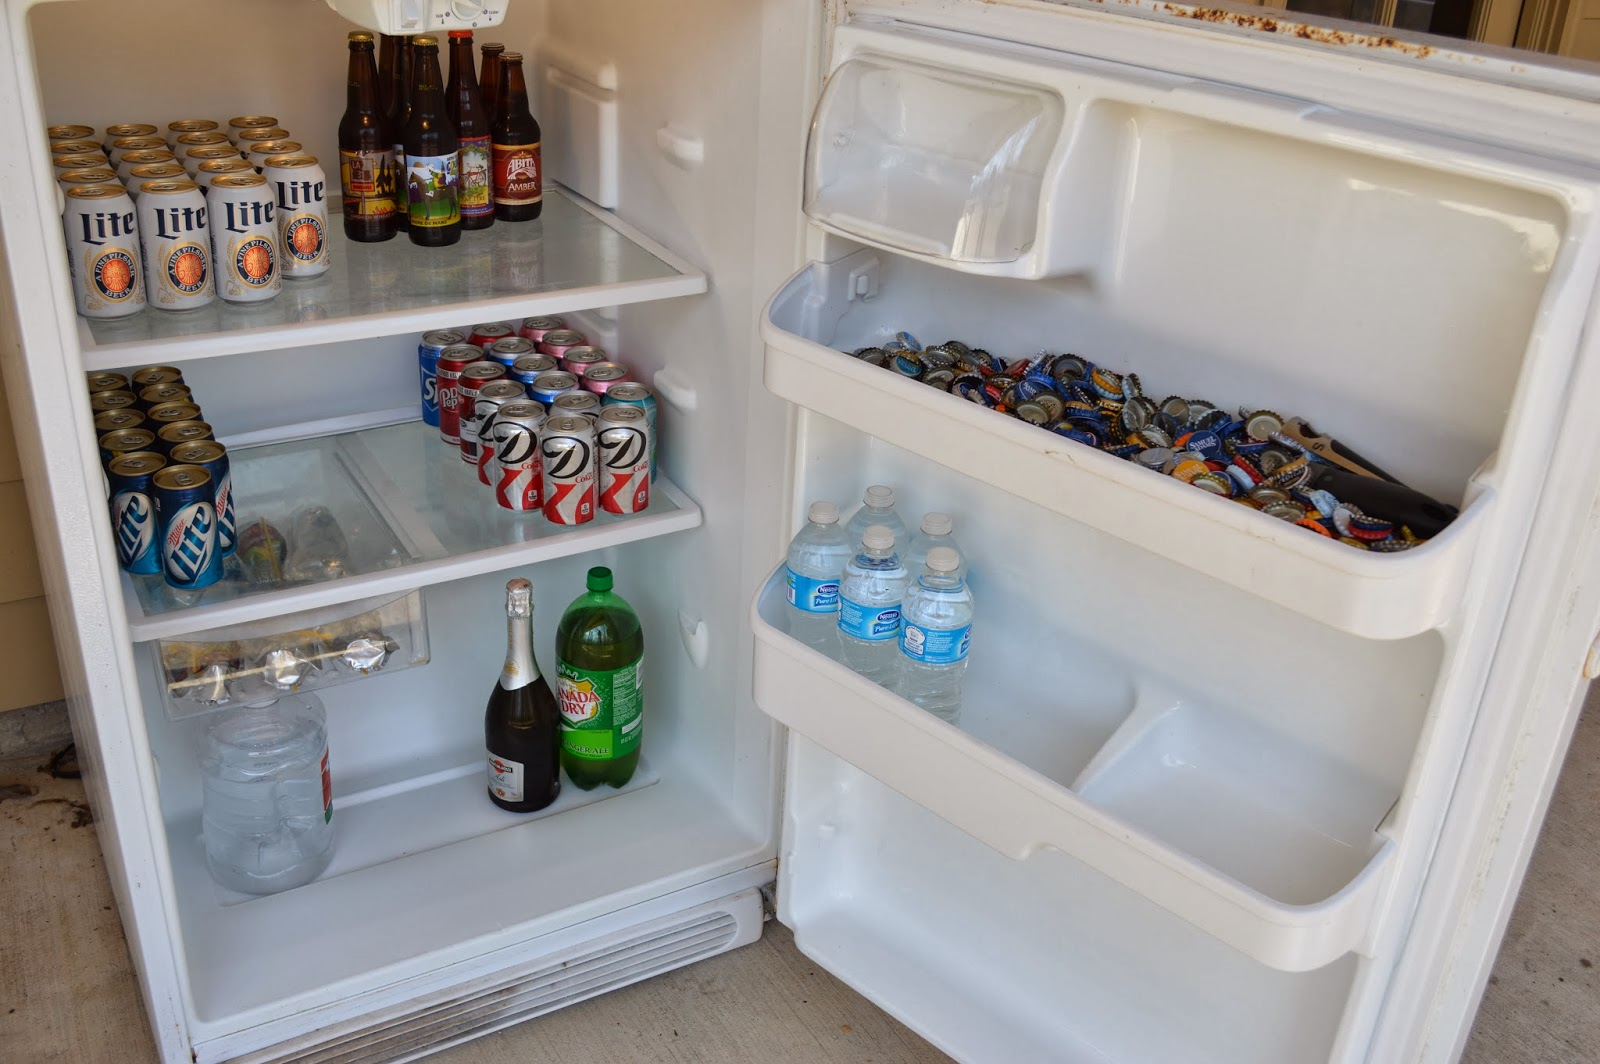 Moving Sale Sold White Frigidaire Refrigerator 125